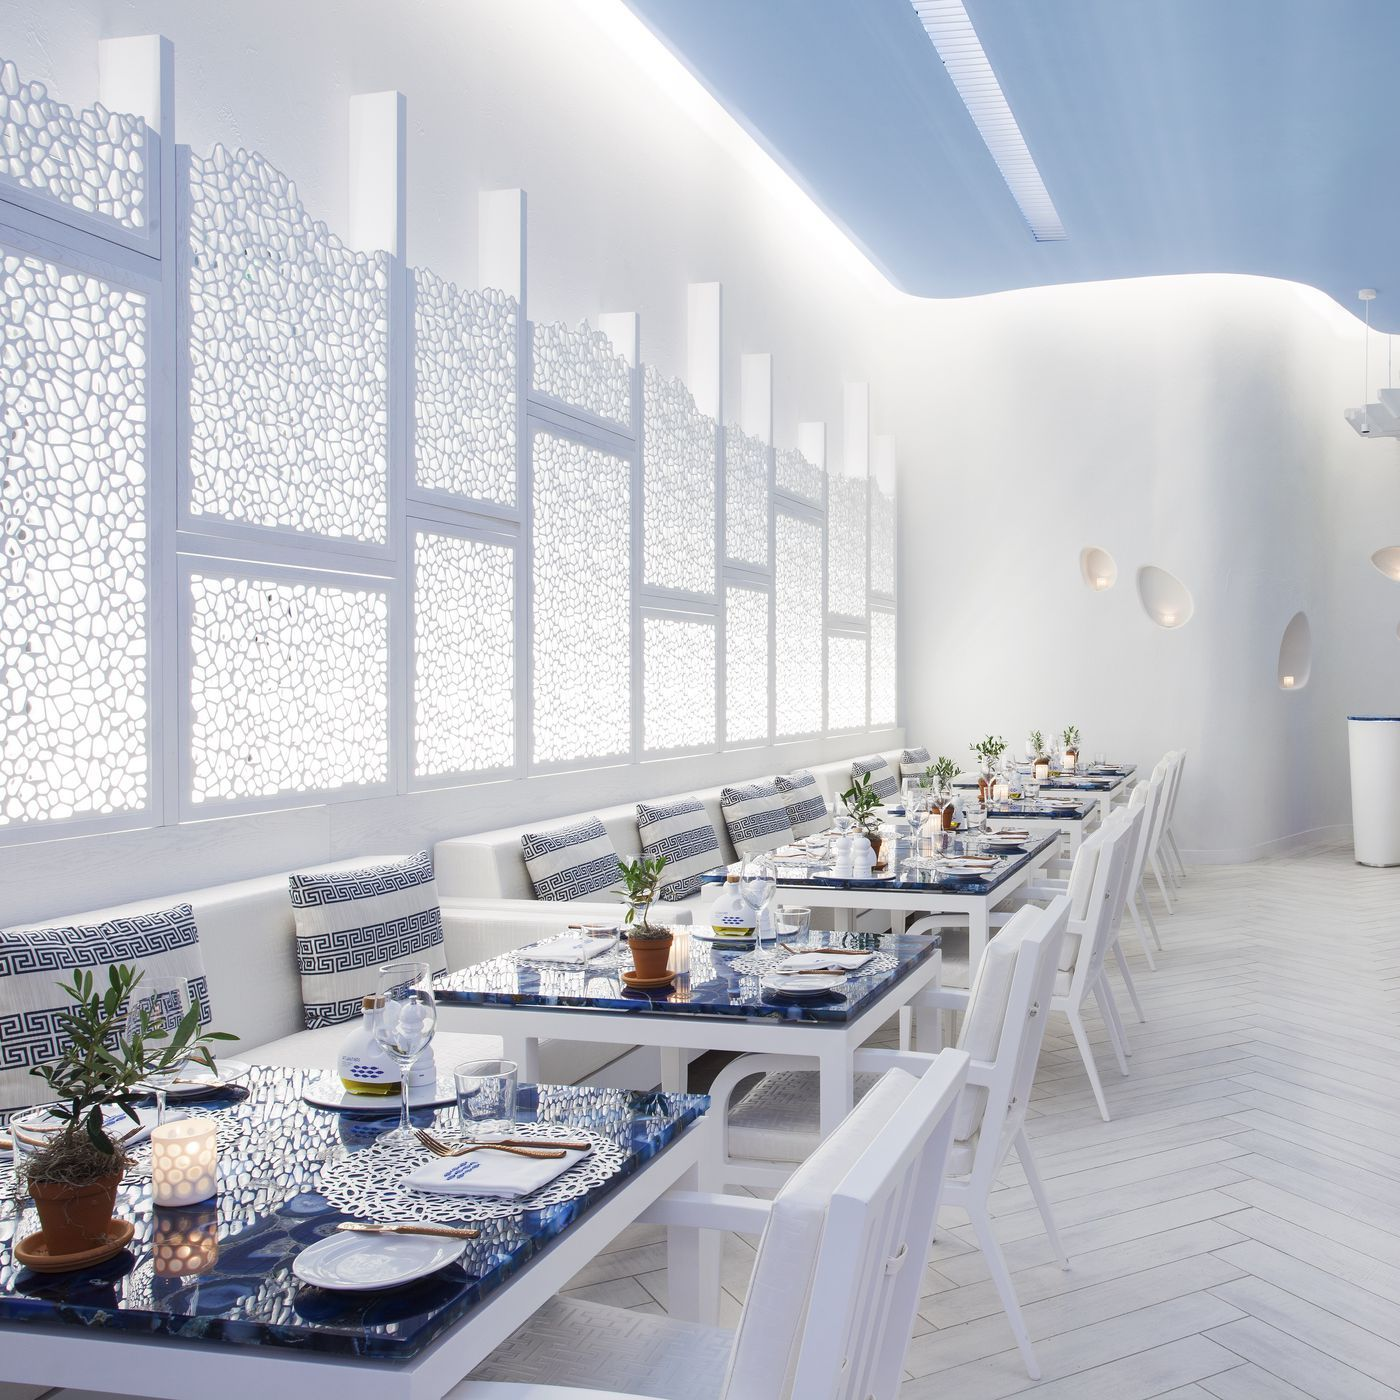 Pin By Designsense Inc On Michael Wolk Design Restaurant